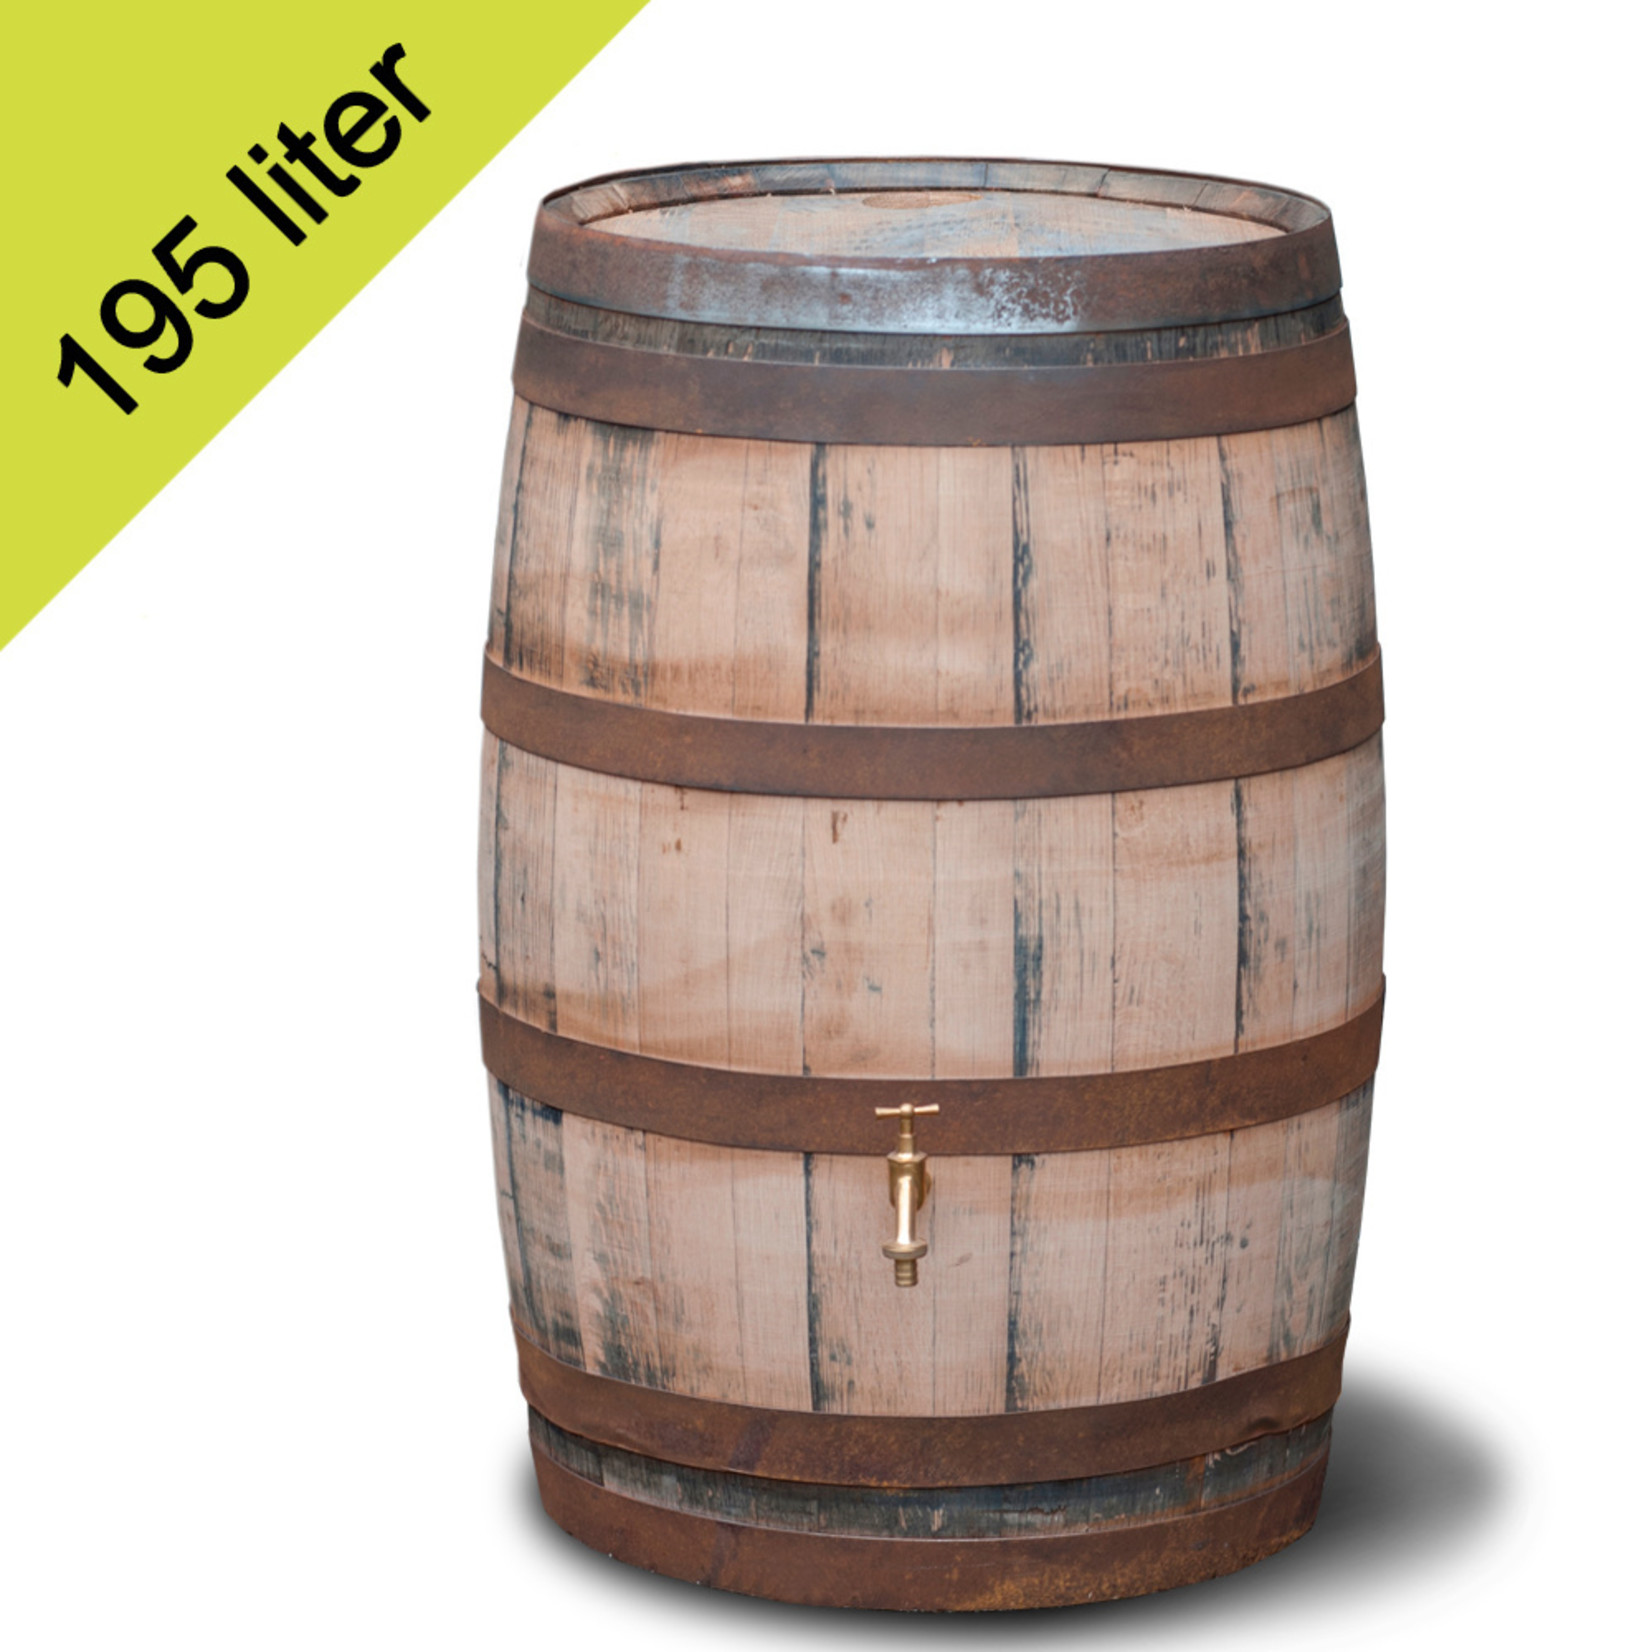 Ton Whiskey 195 liter hergebruik GESCHUURD